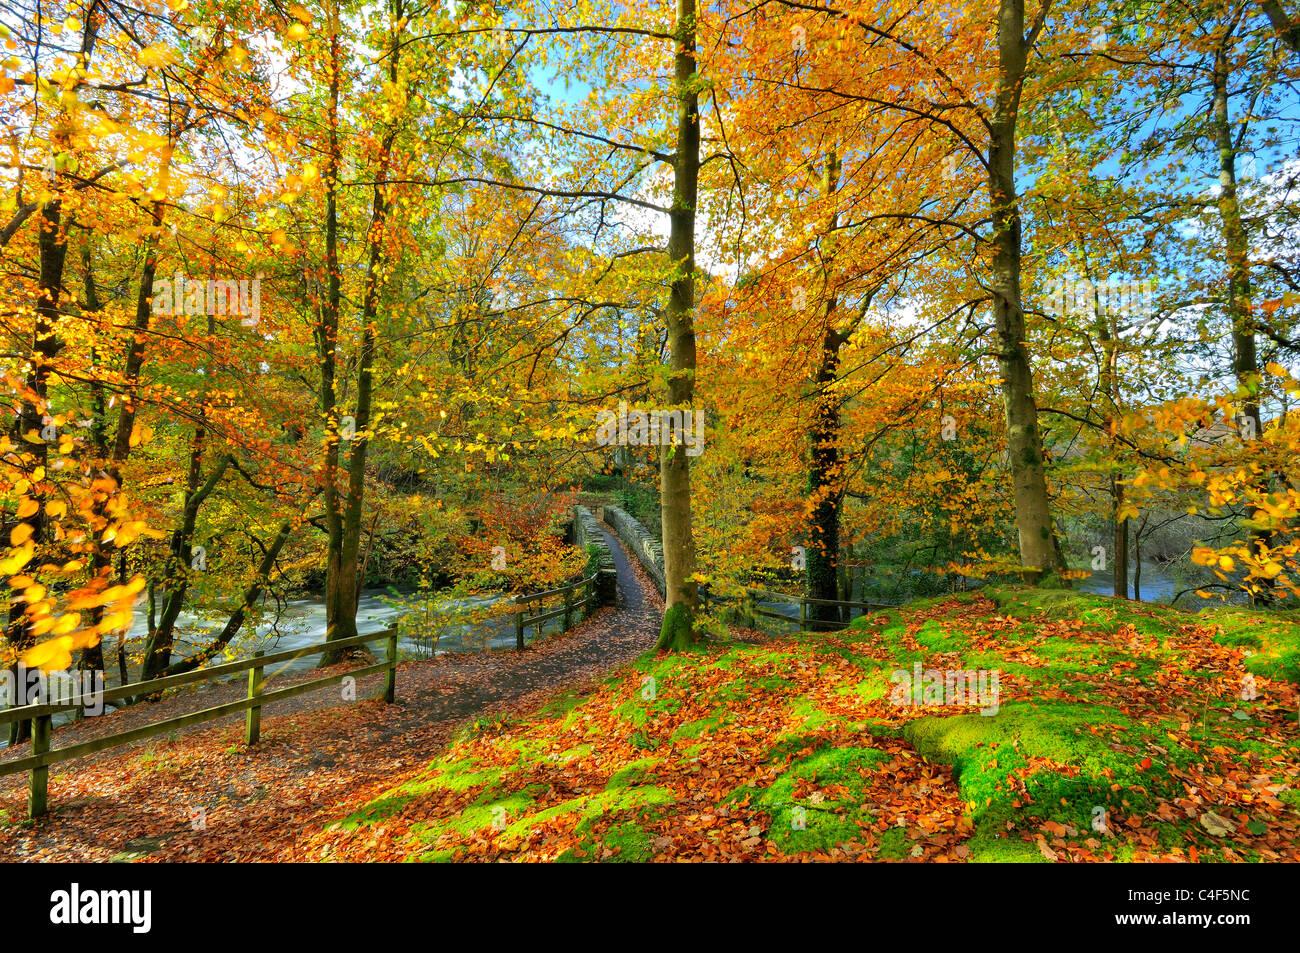 forest,autumn,fall,path,river,dappled,sunshine - Stock Image